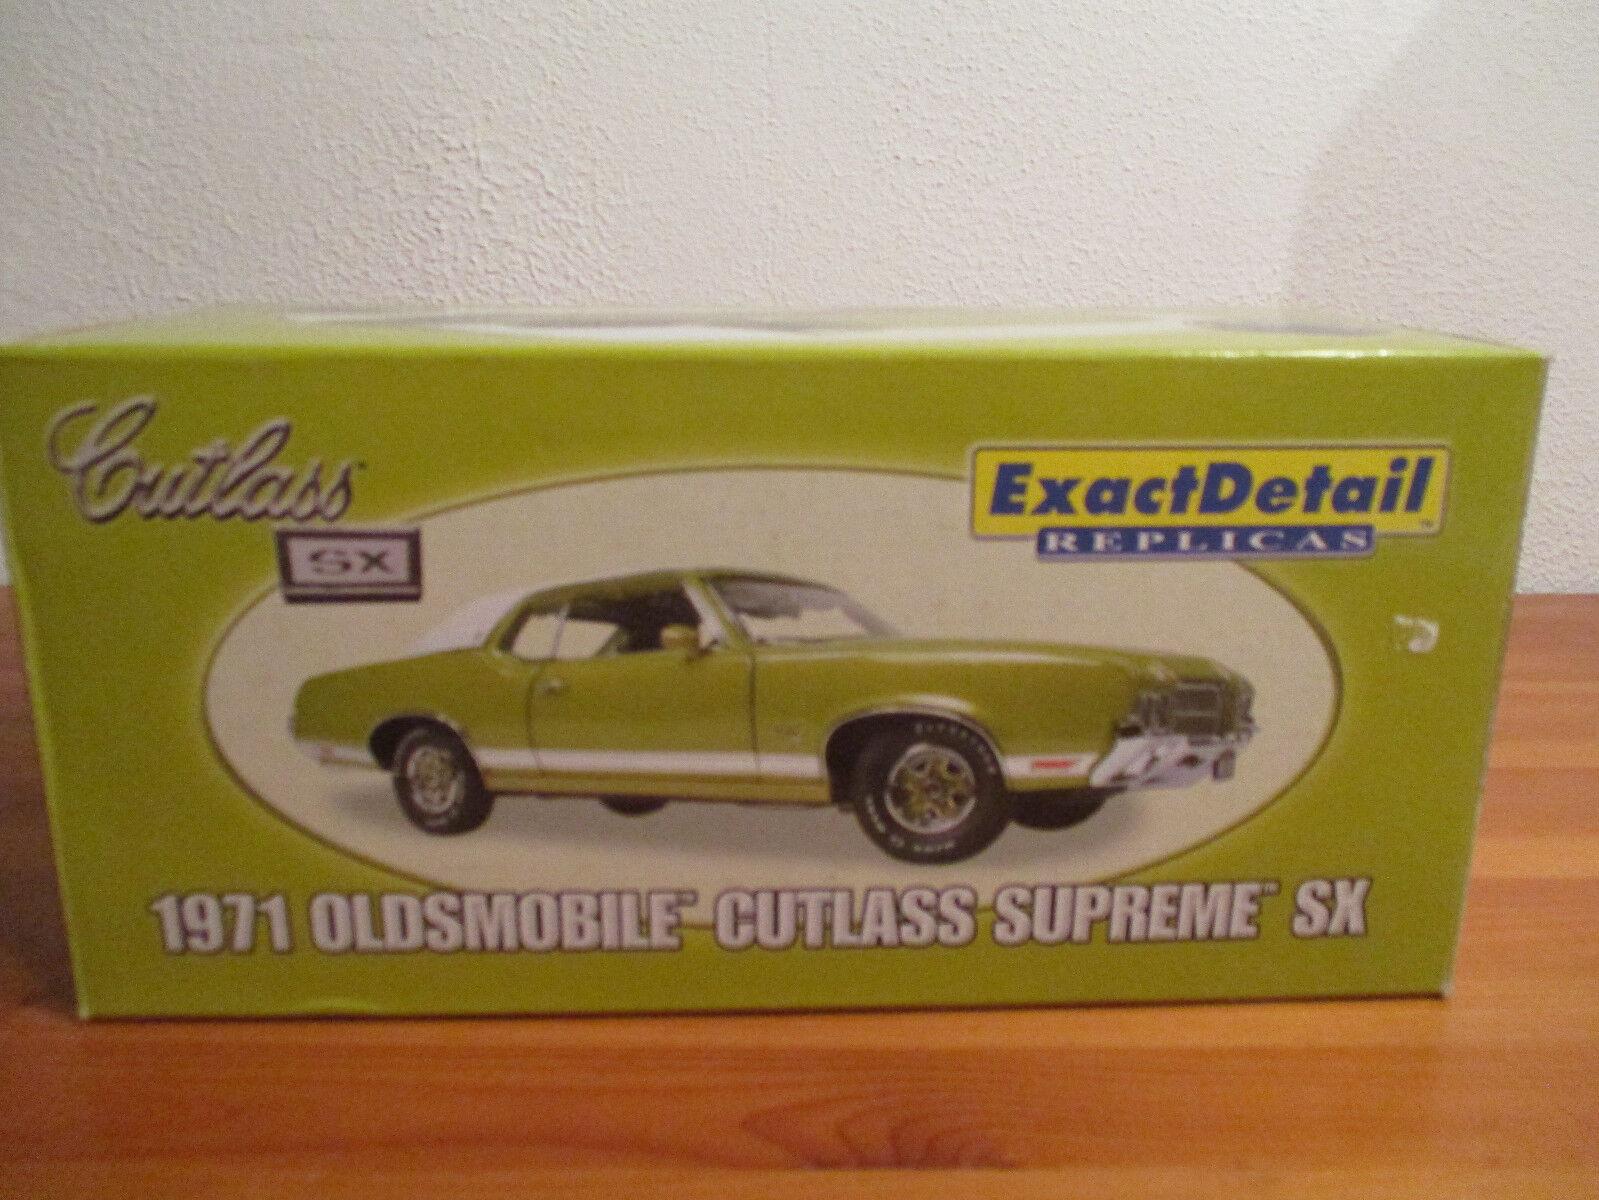 ( Go) 1 18 exact detail detail detail REPLICAS 1971 oldsmobile cutlass supreme sx 2b85f6